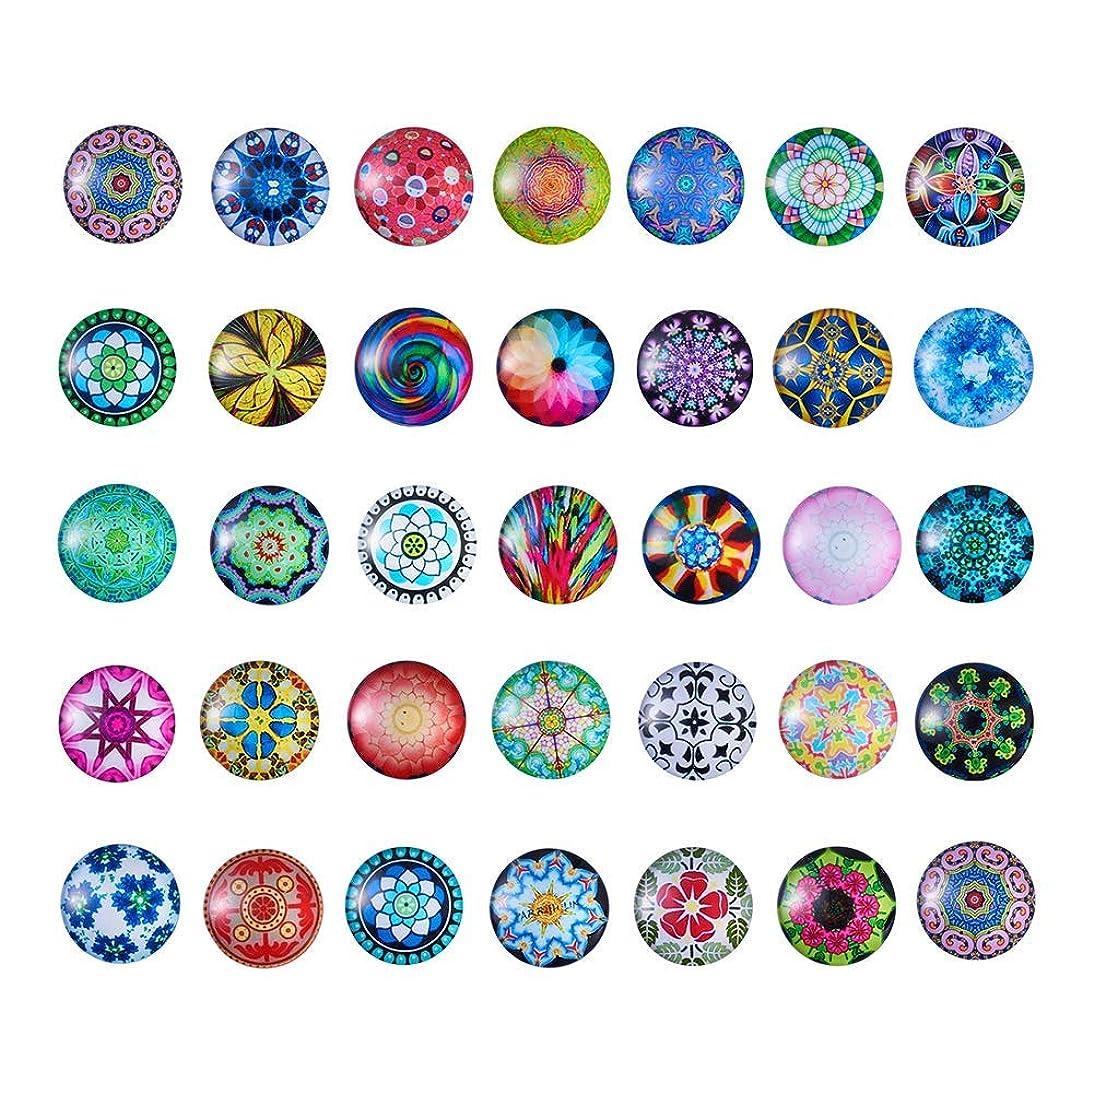 Pandahall 50pcs/Box Mosaic Printed Flat Back Glass Half Round/Dome Cabochons 25mm for DIY Jewelry Making